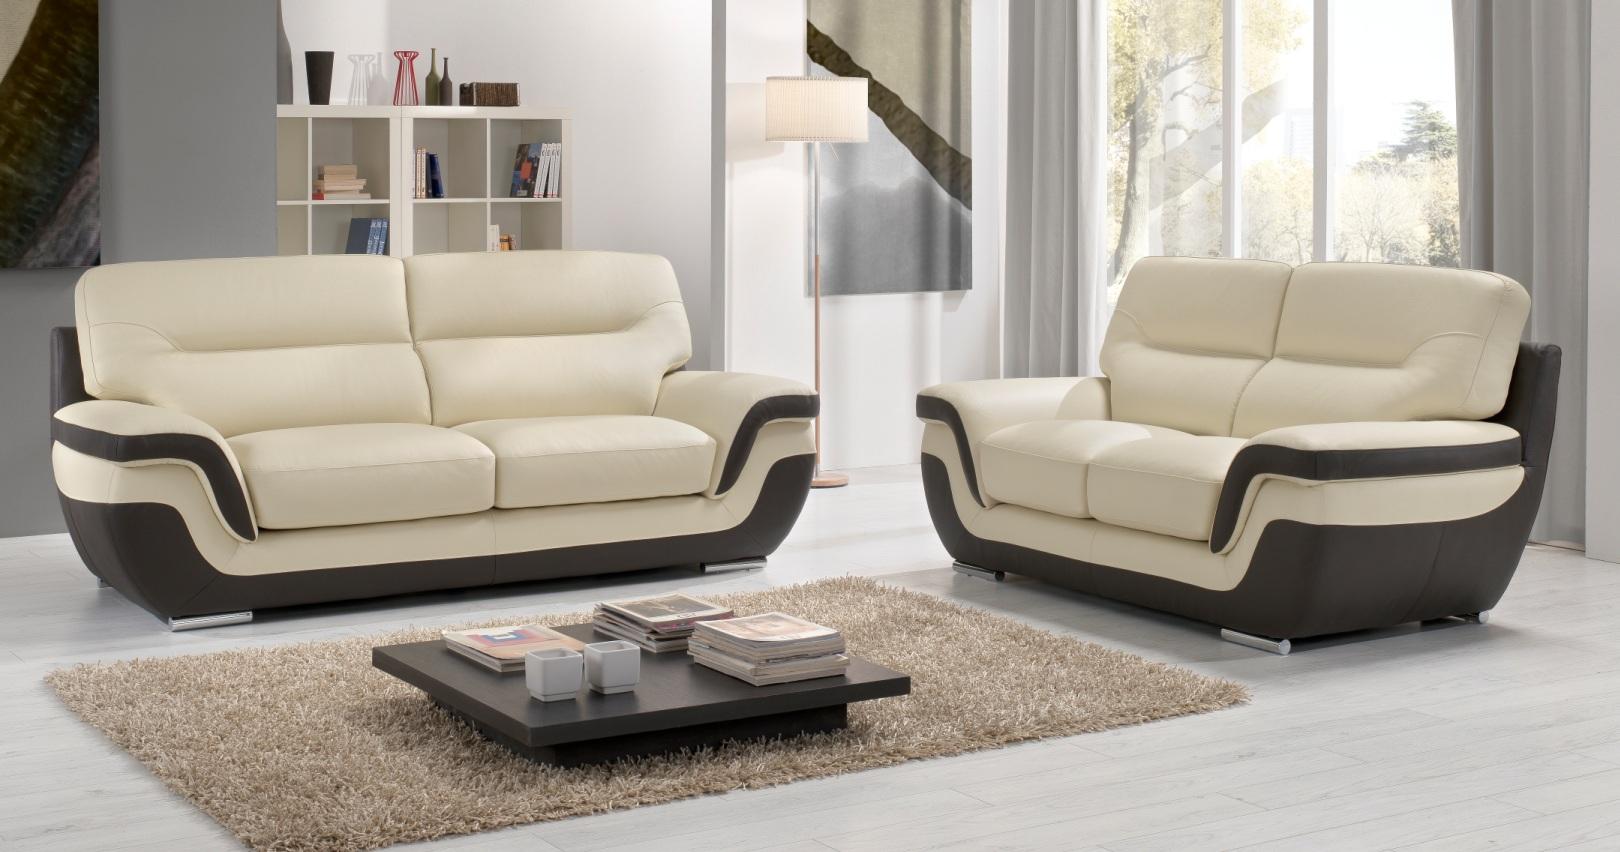 canap cuir bicolore rodrigue 100 cuir. Black Bedroom Furniture Sets. Home Design Ideas